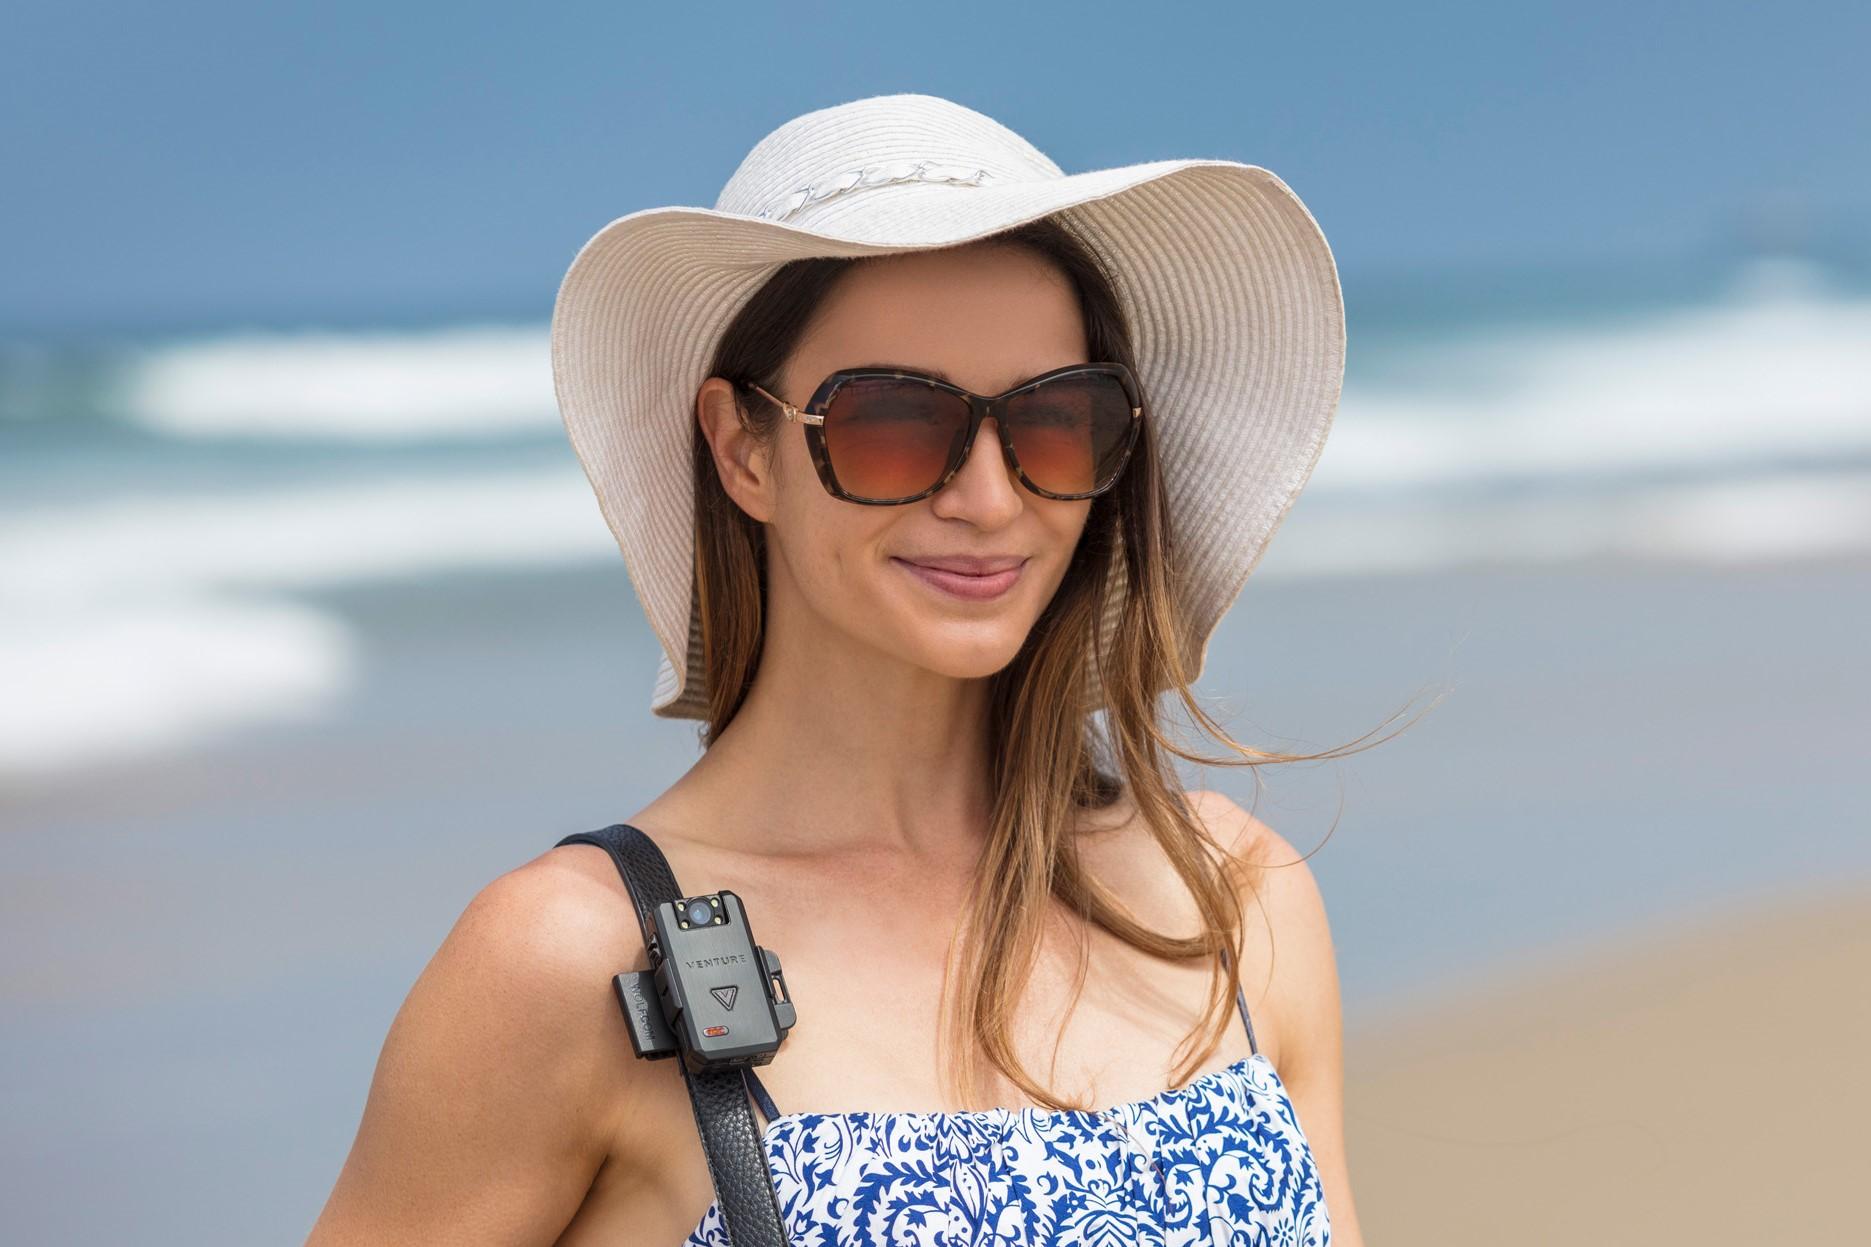 Venture bodycam clipped on a woman's purse